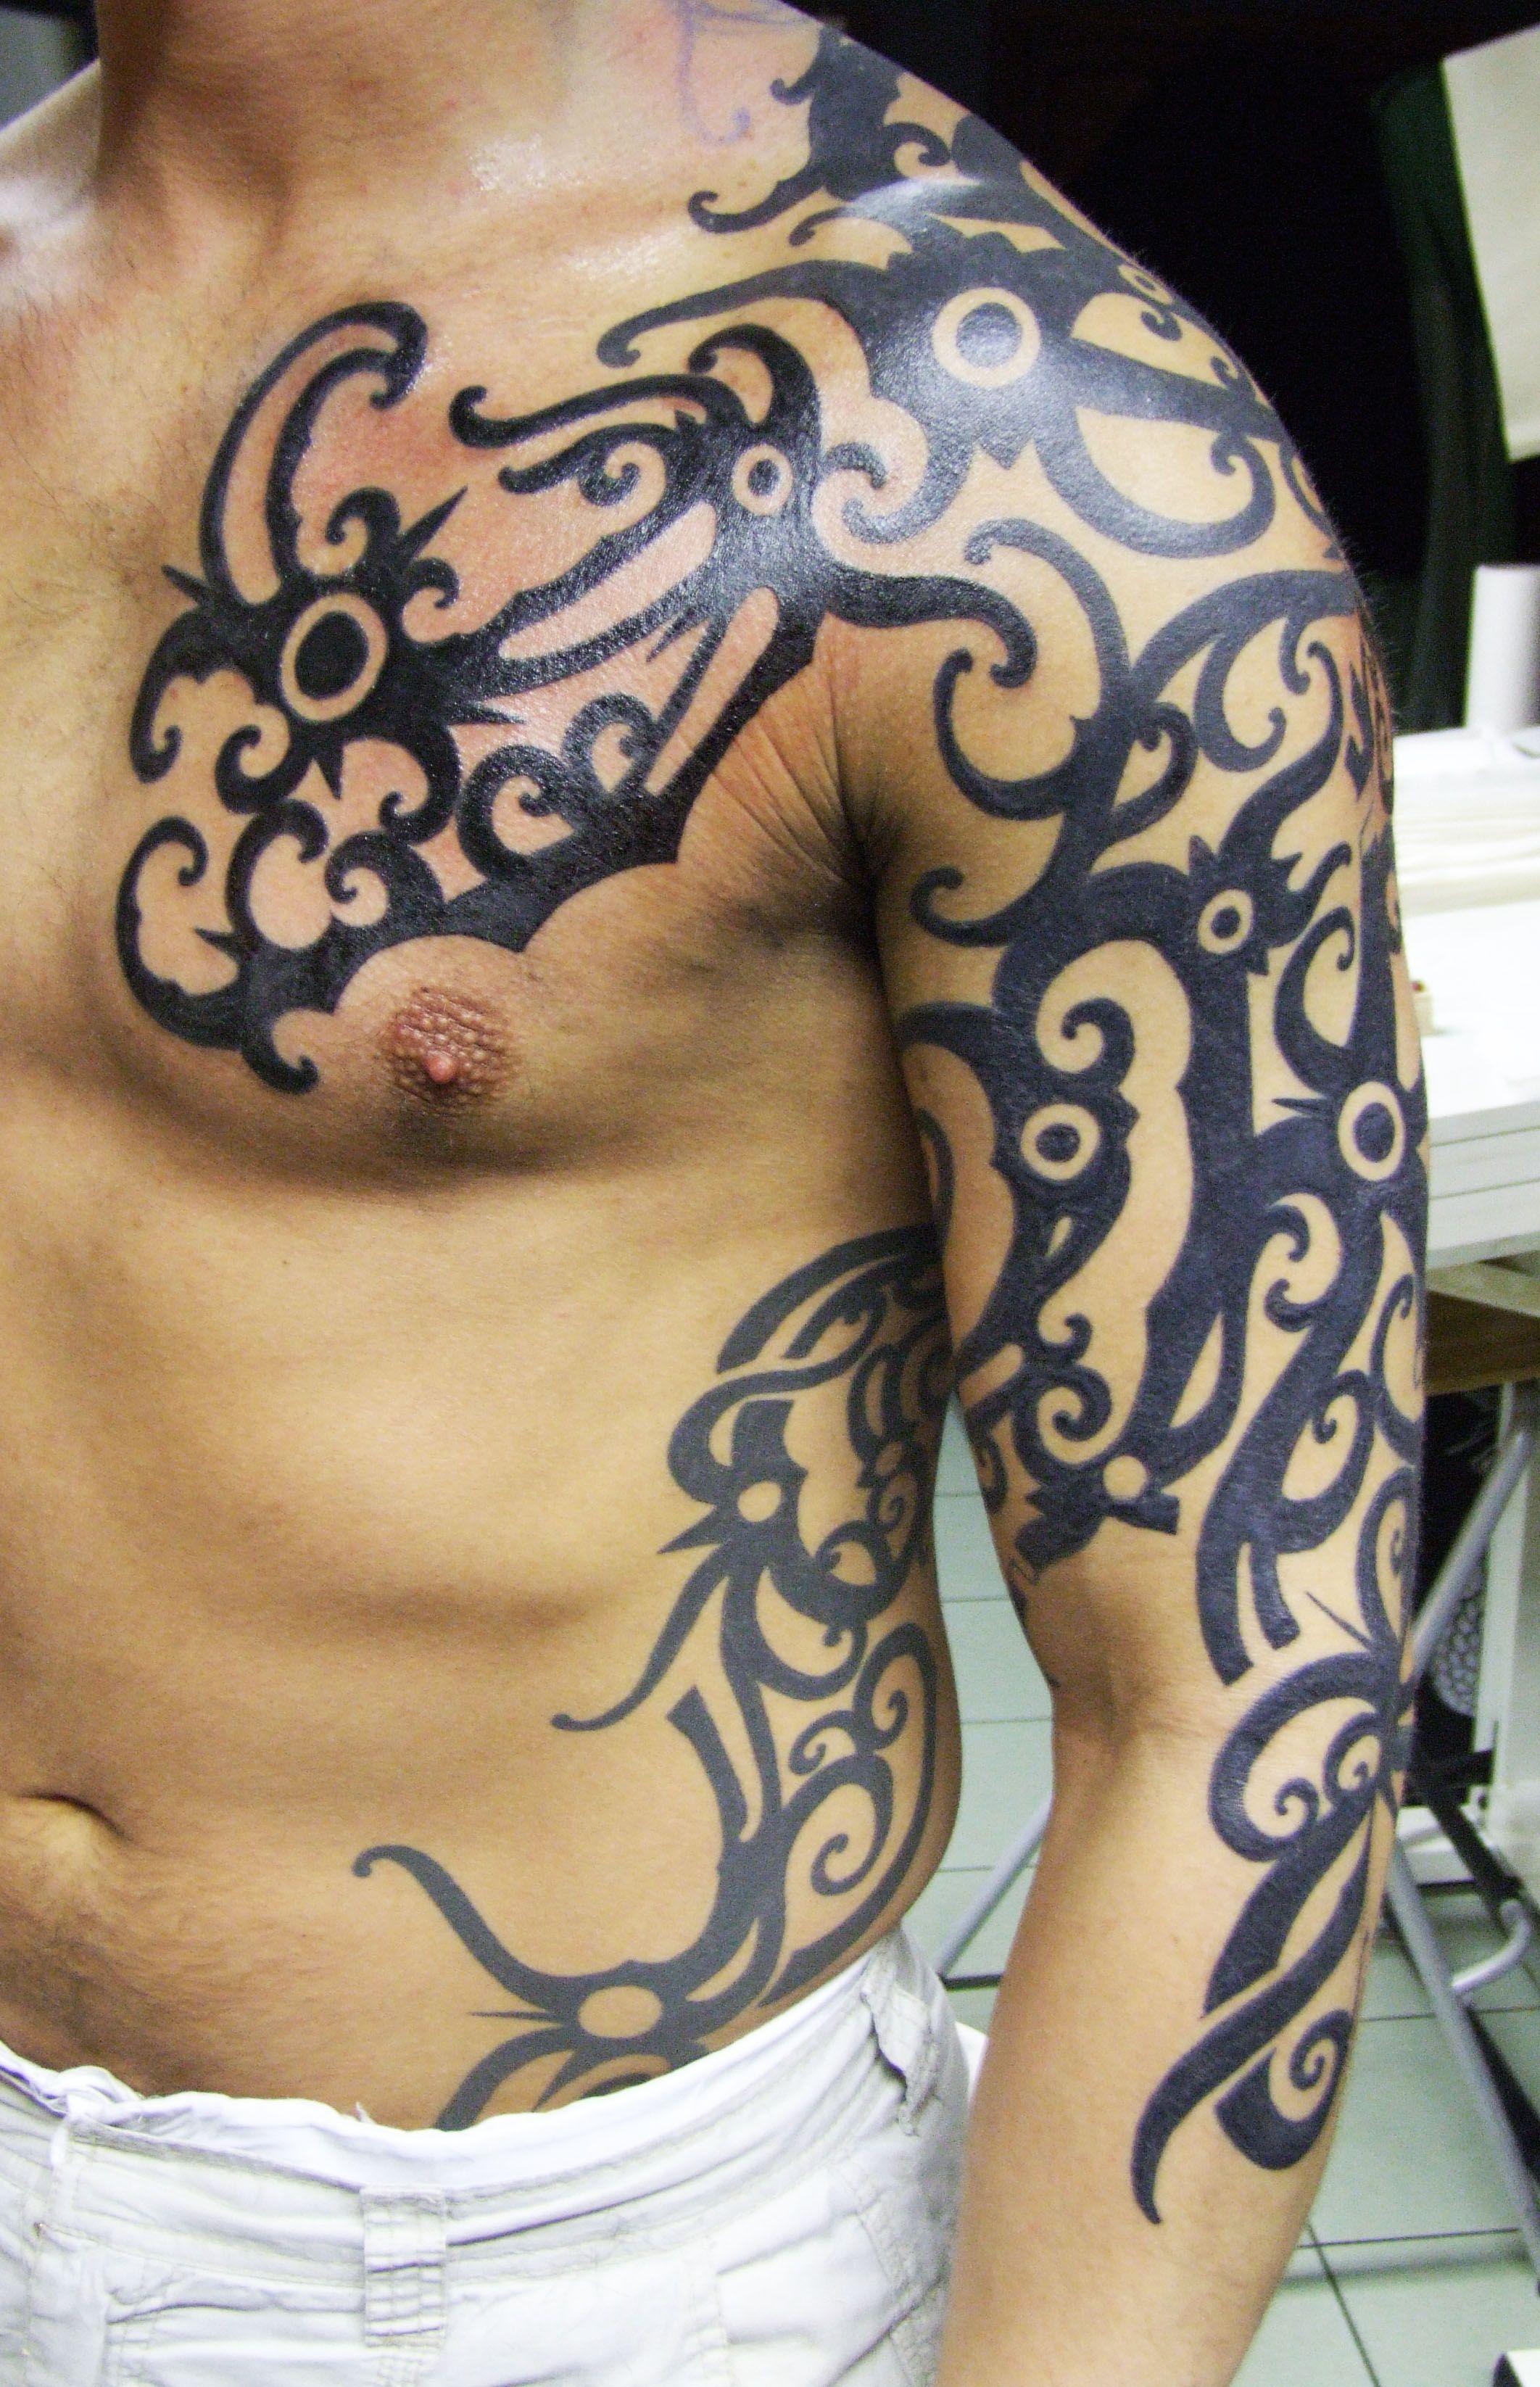 borneo tattoos design by blind nobility blindnobility2014 czs v ll tattoo borneo. Black Bedroom Furniture Sets. Home Design Ideas